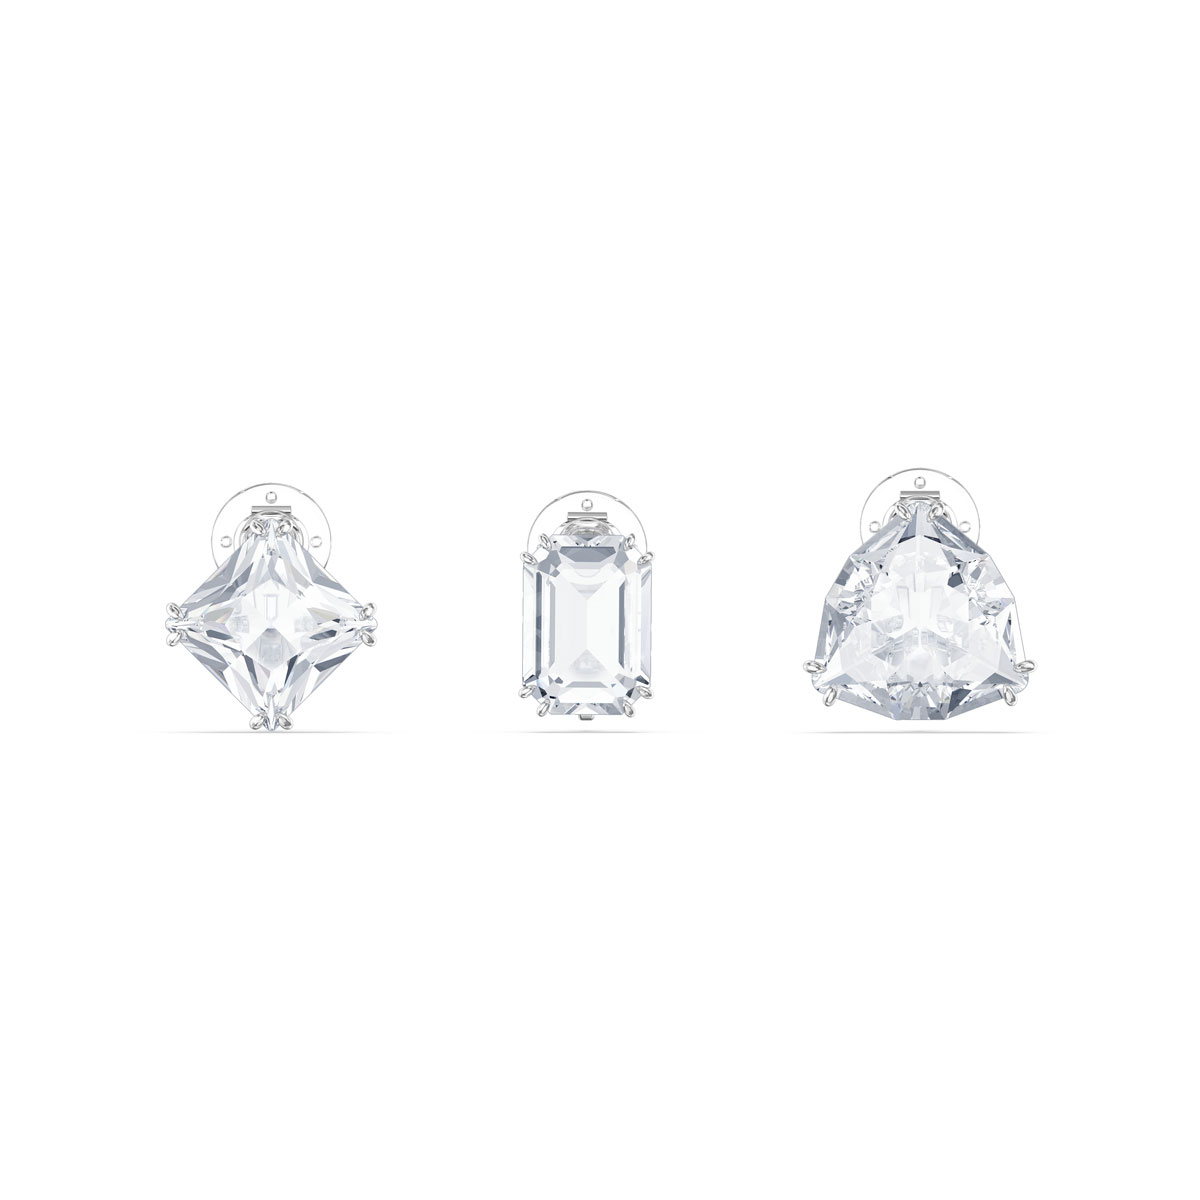 Swarovski Millenia Clip Earrings Single, Set, White, Rhodium Plated